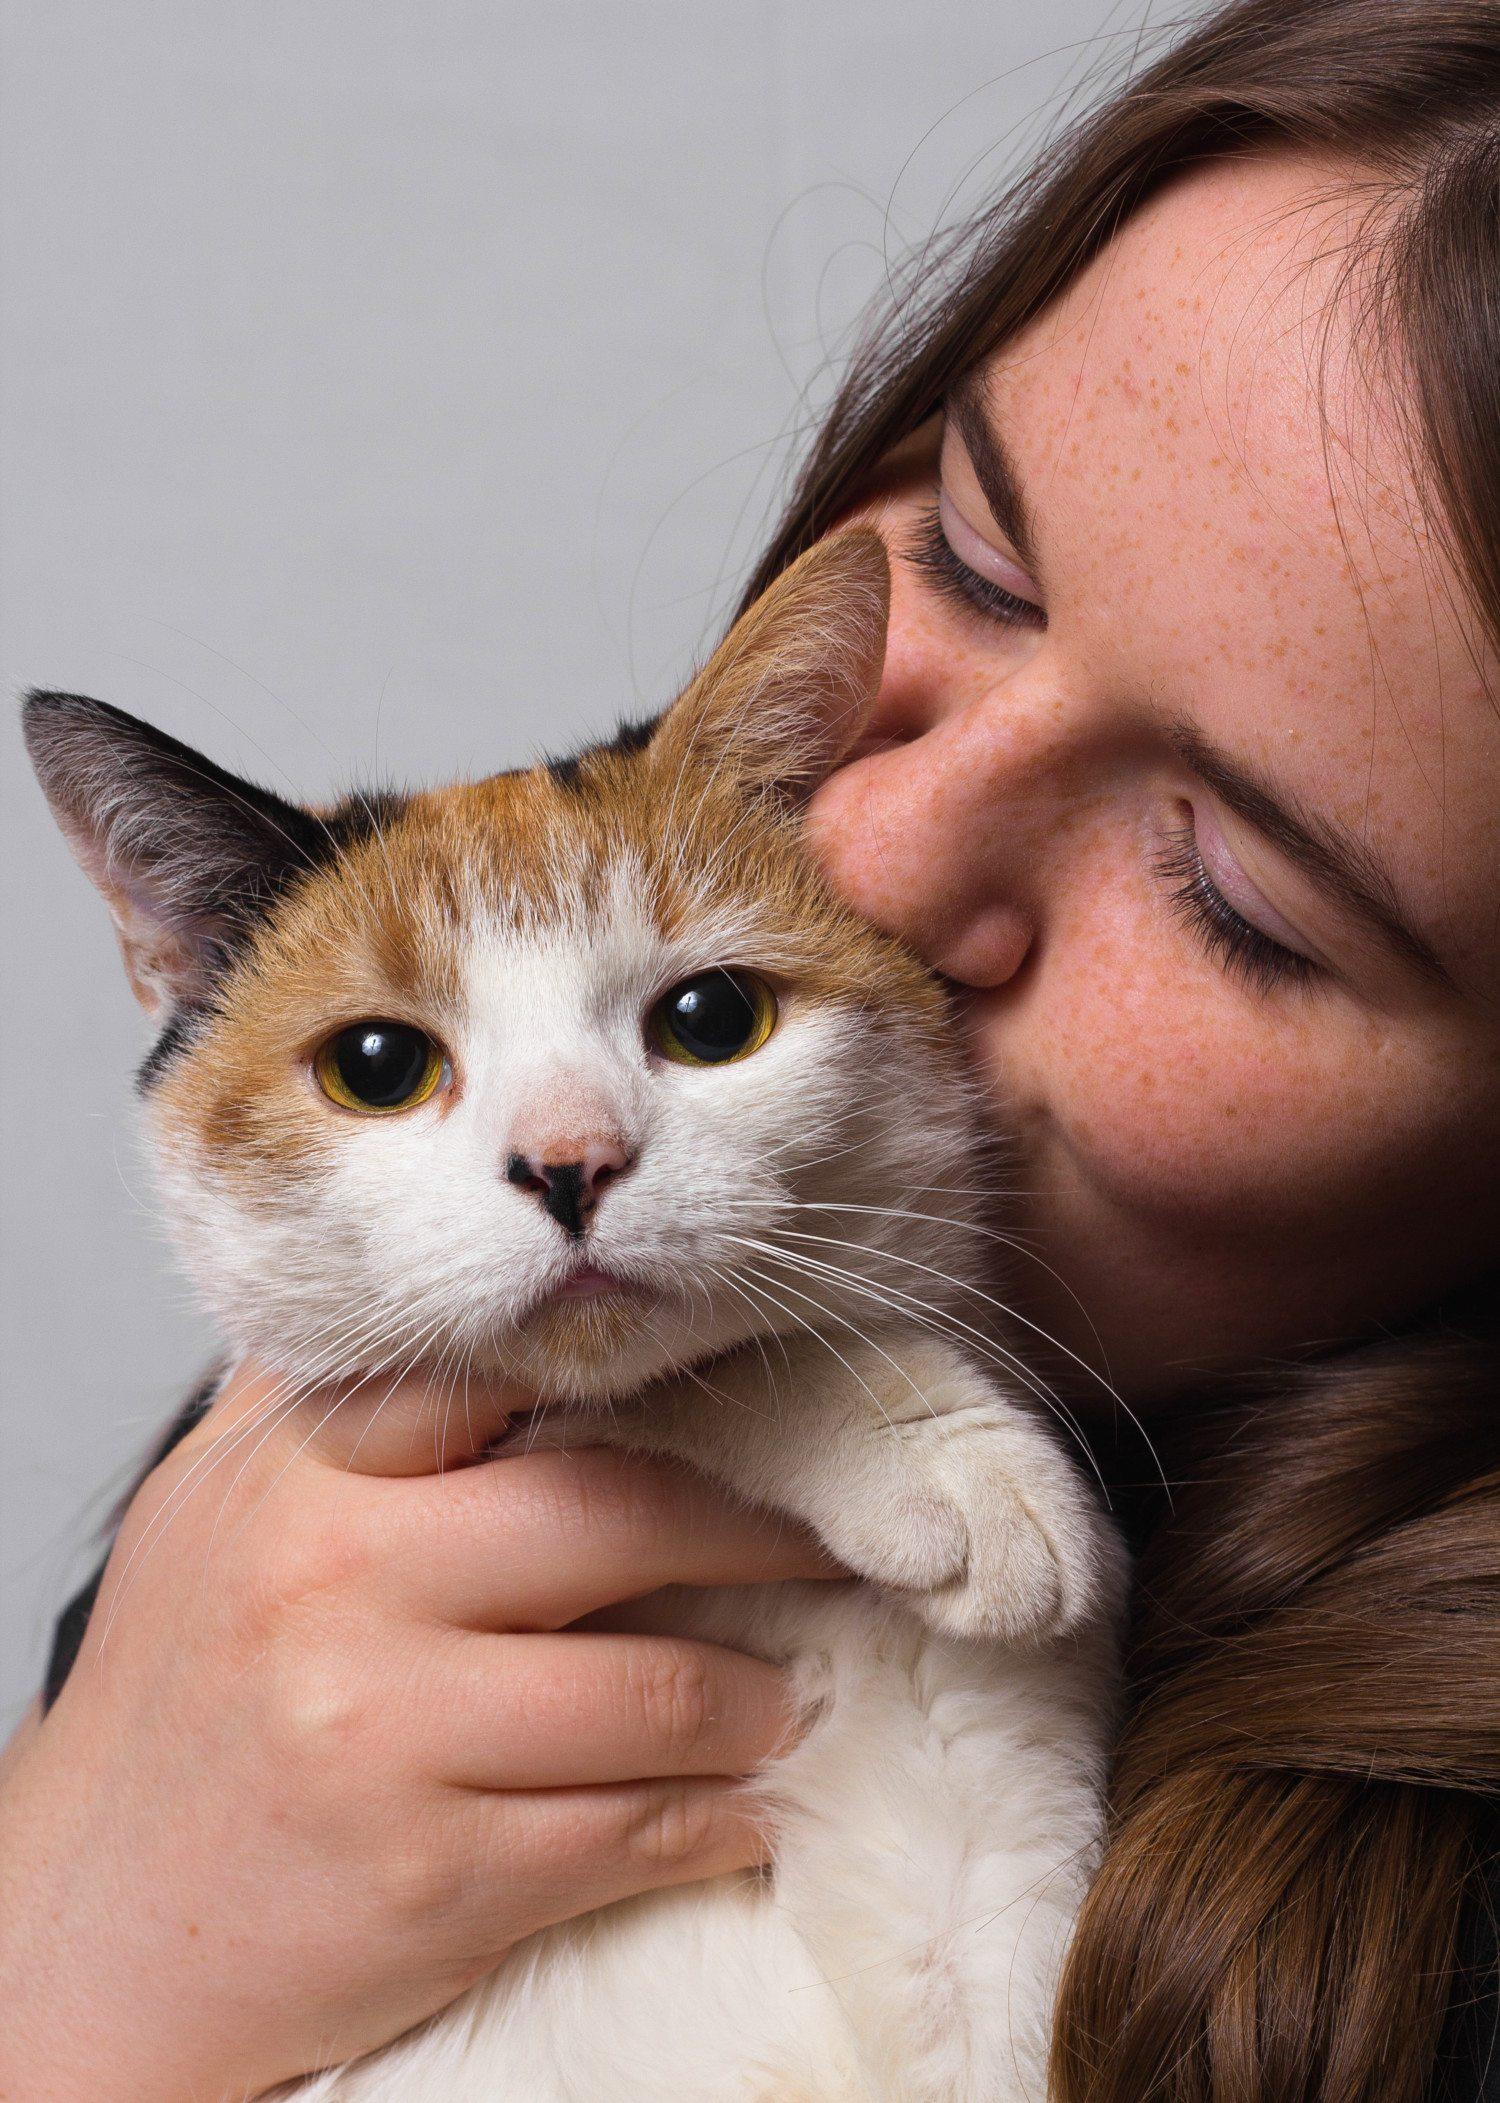 holding cat photo